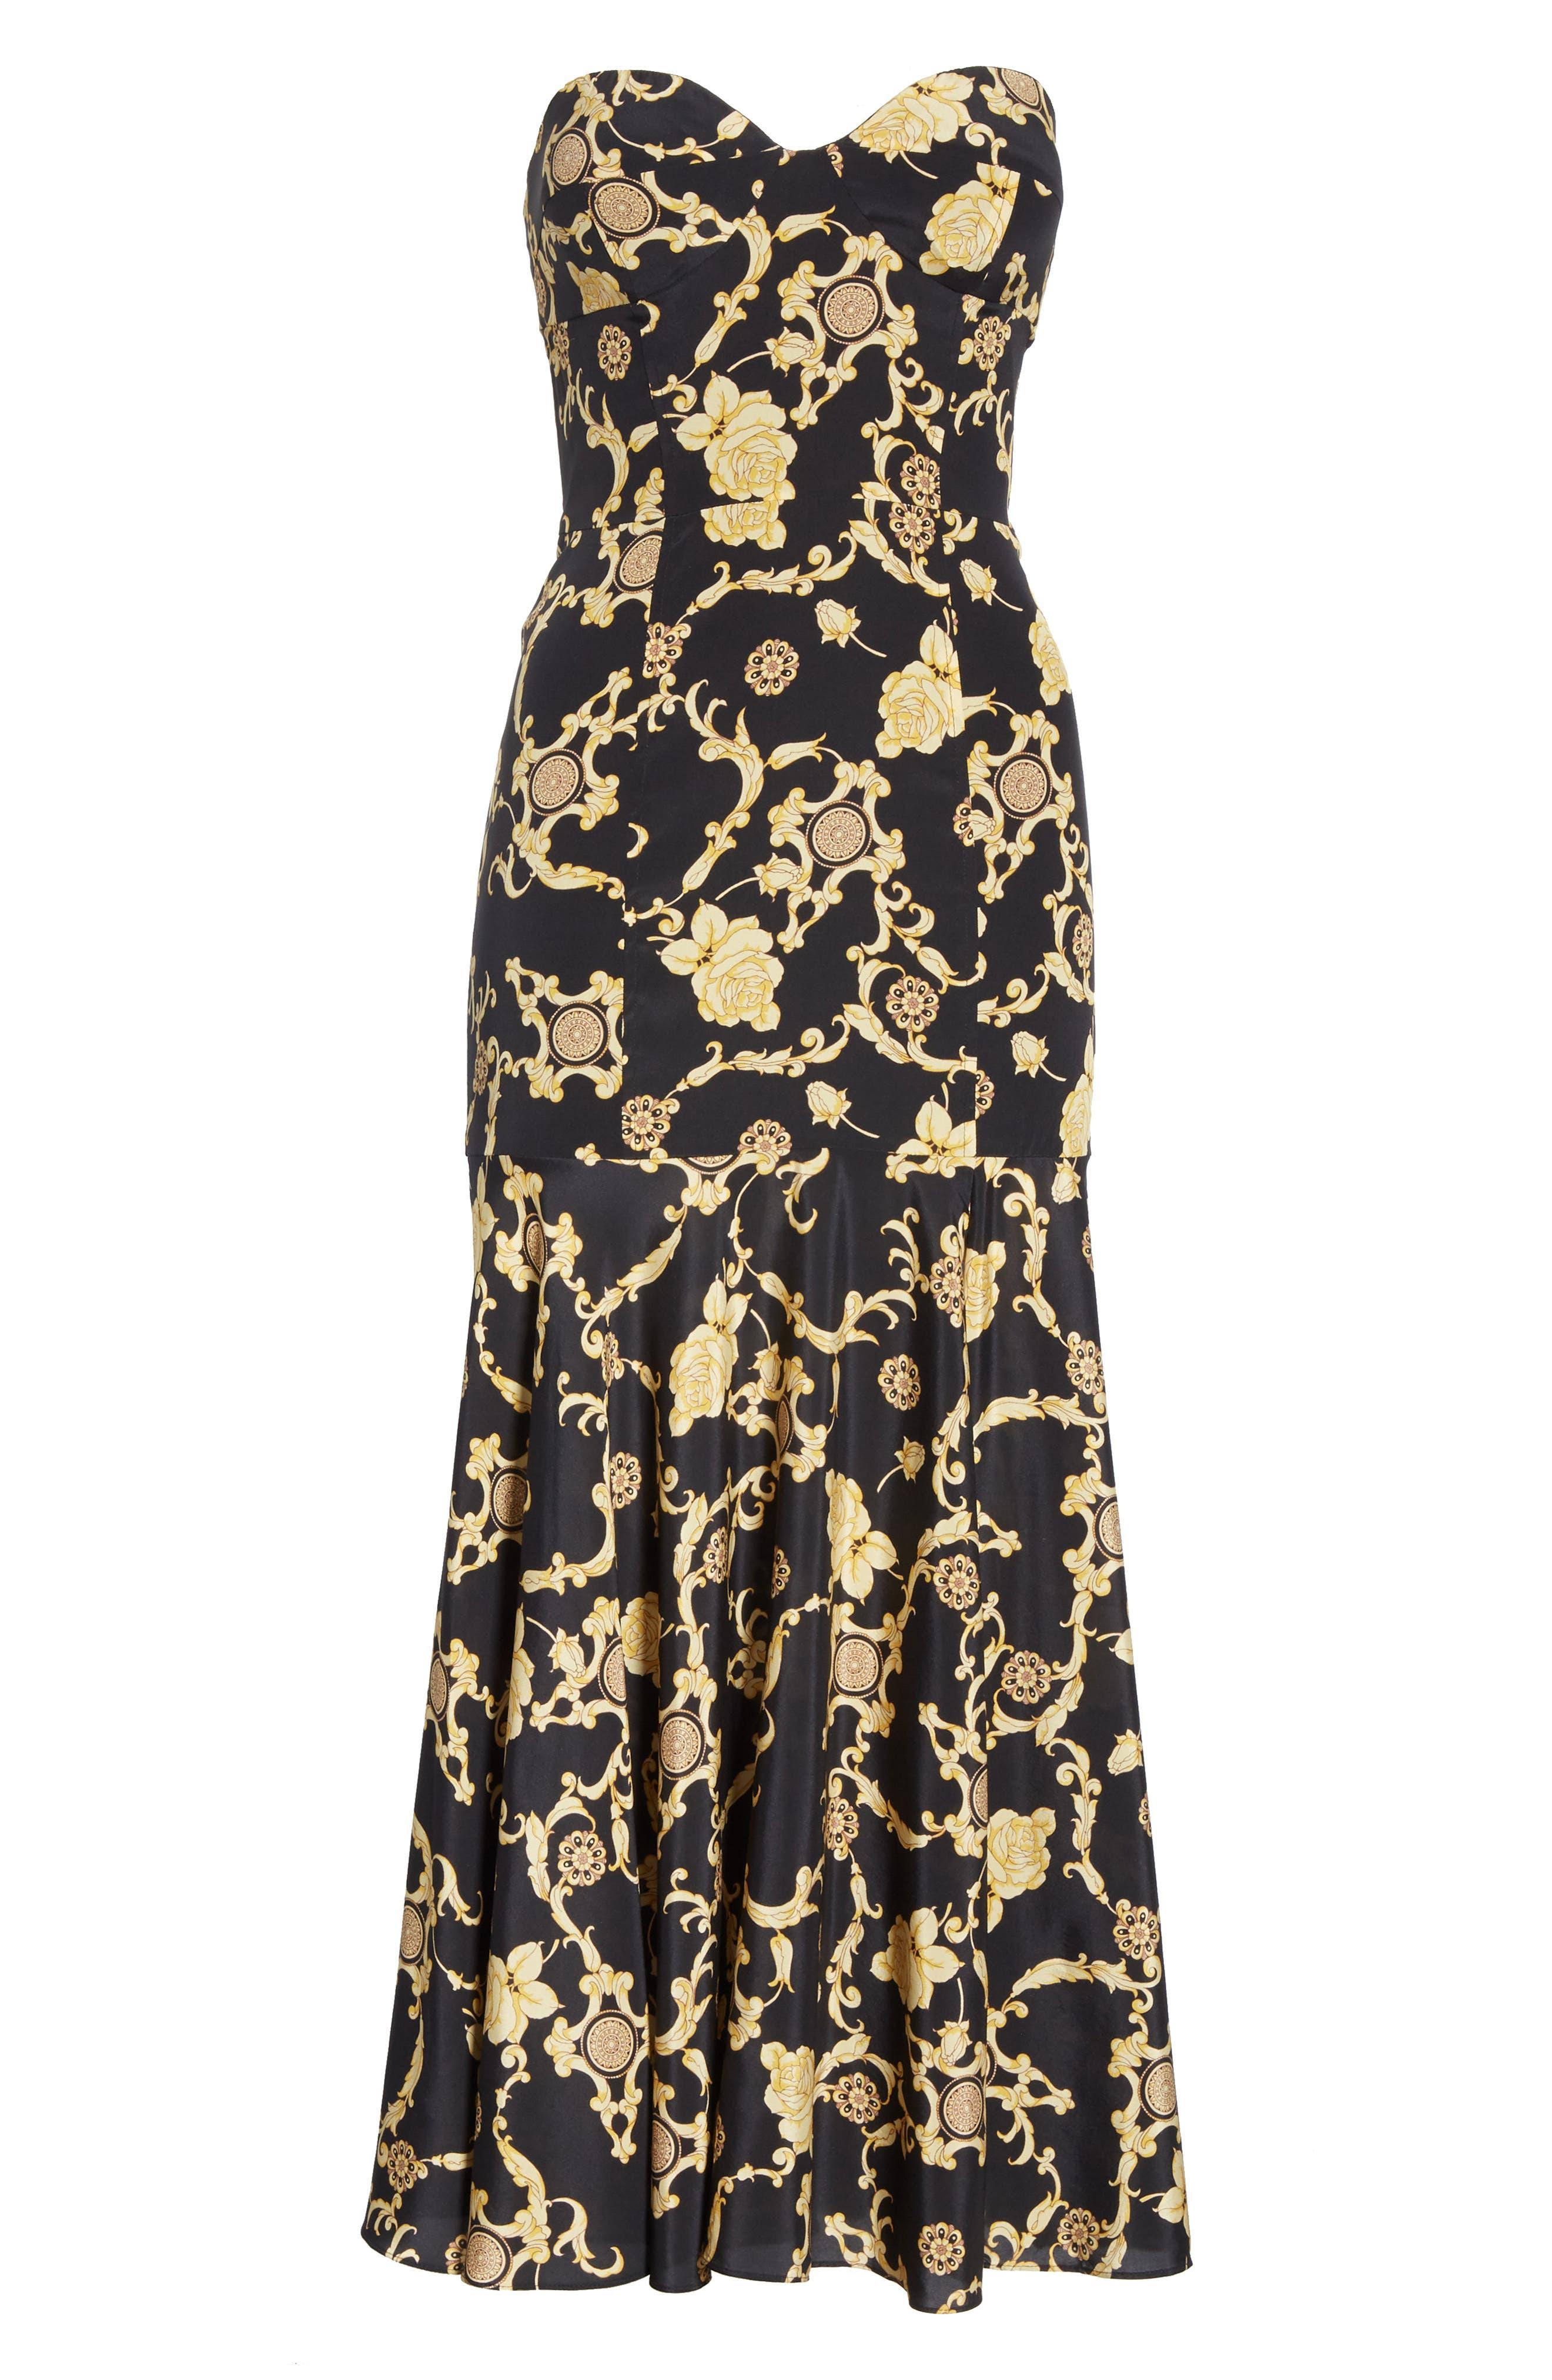 Annika Floral Print Strapless Stretch Silk Dress,                             Alternate thumbnail 6, color,                             BLACK/ GOLD